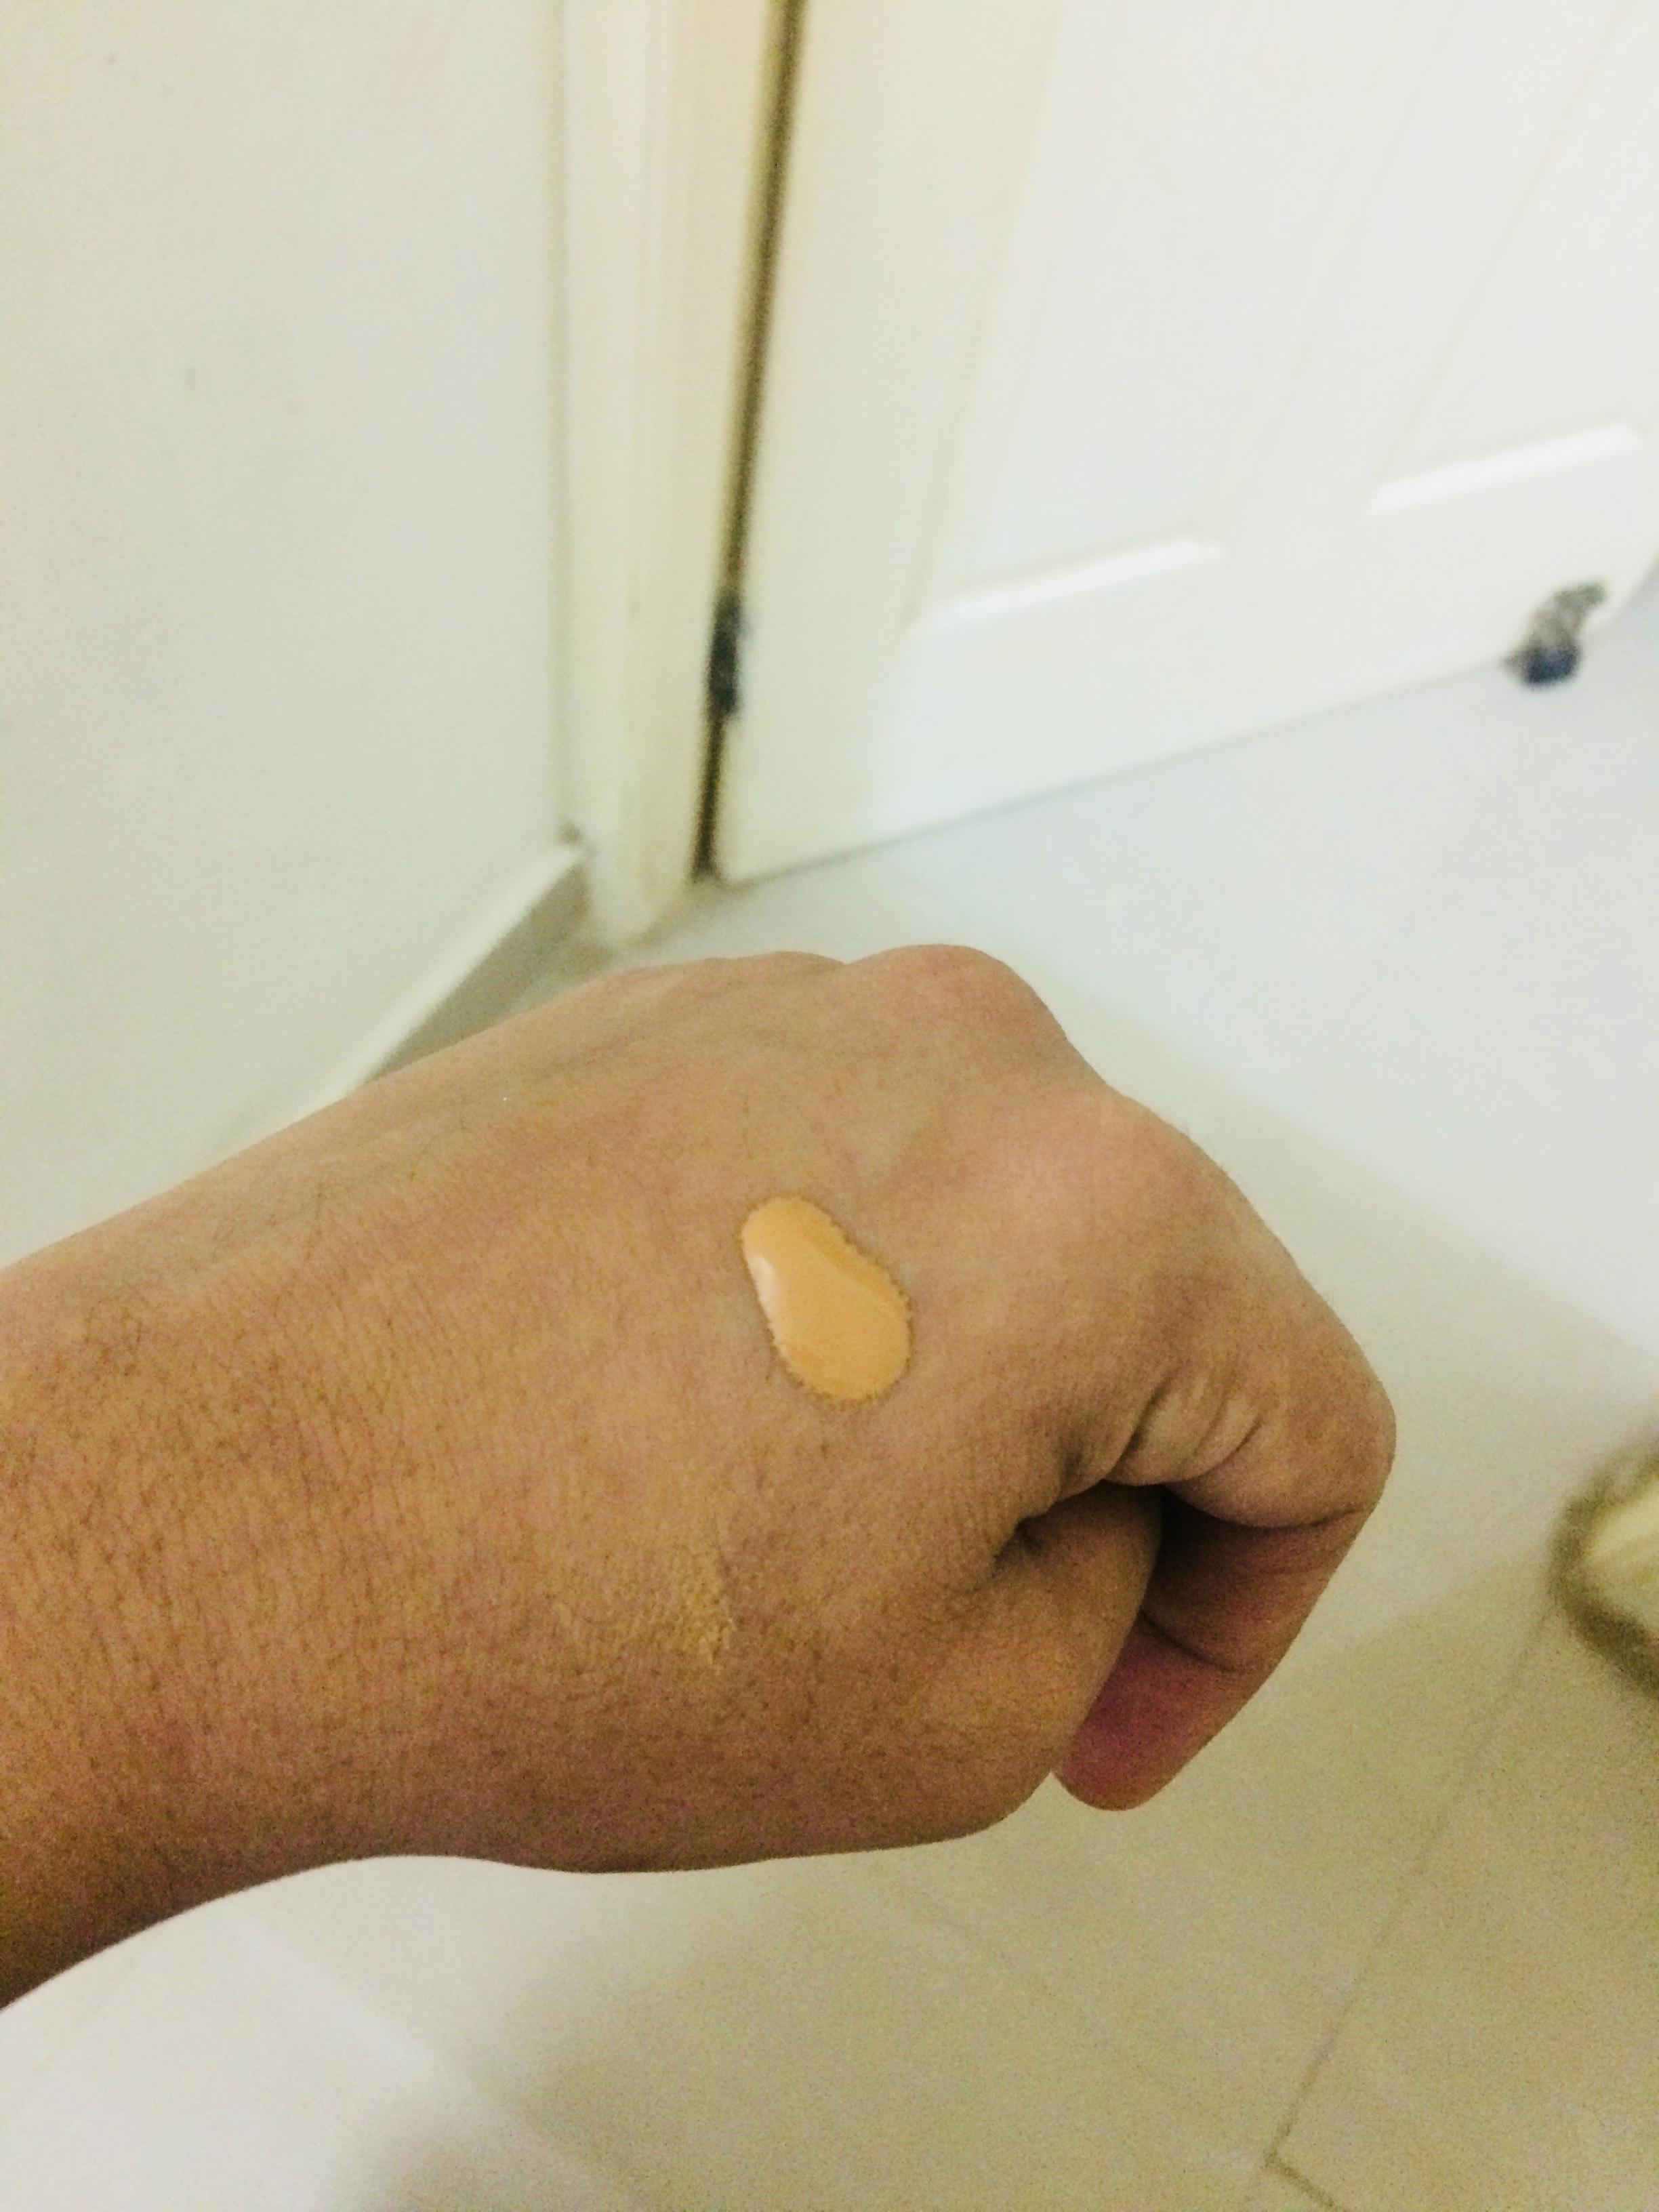 fab-review-Best Sunscreen For Oily Skin !!-By sindoori_jayaprakash-2